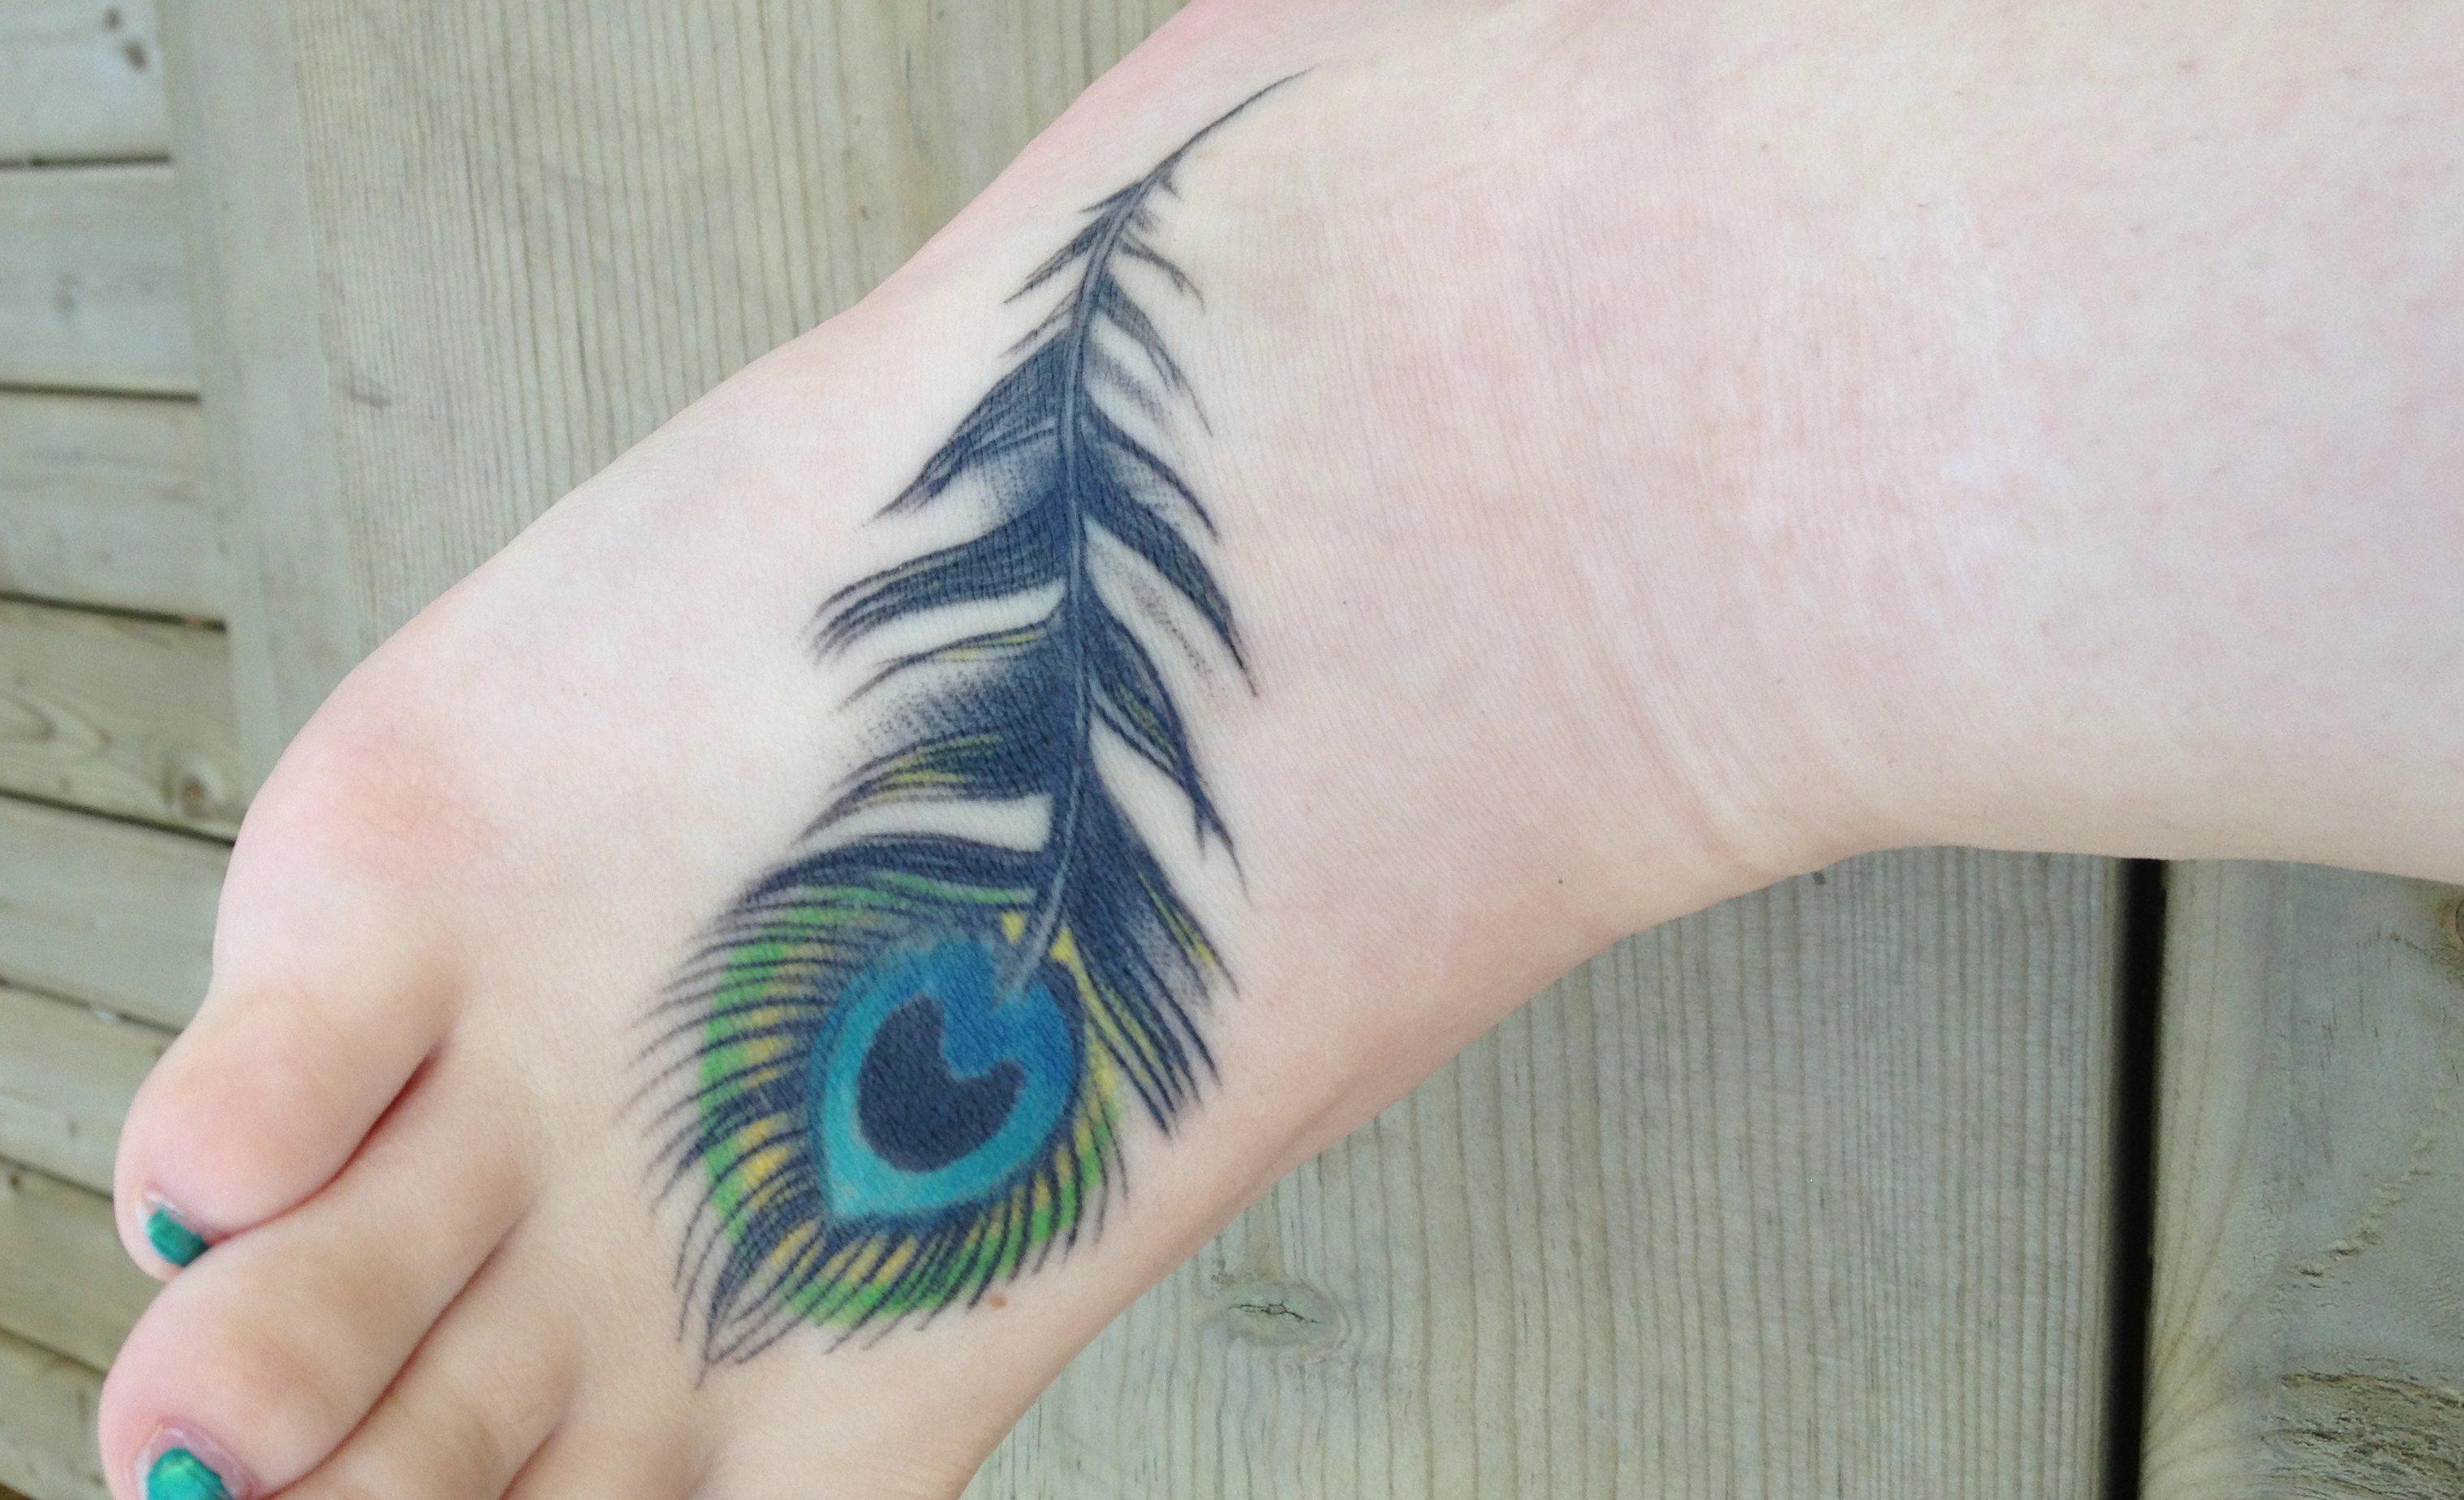 Pfau Tattoo Motive und Pfauenfeder Tattoo Bedeutung alletattoo.de 22